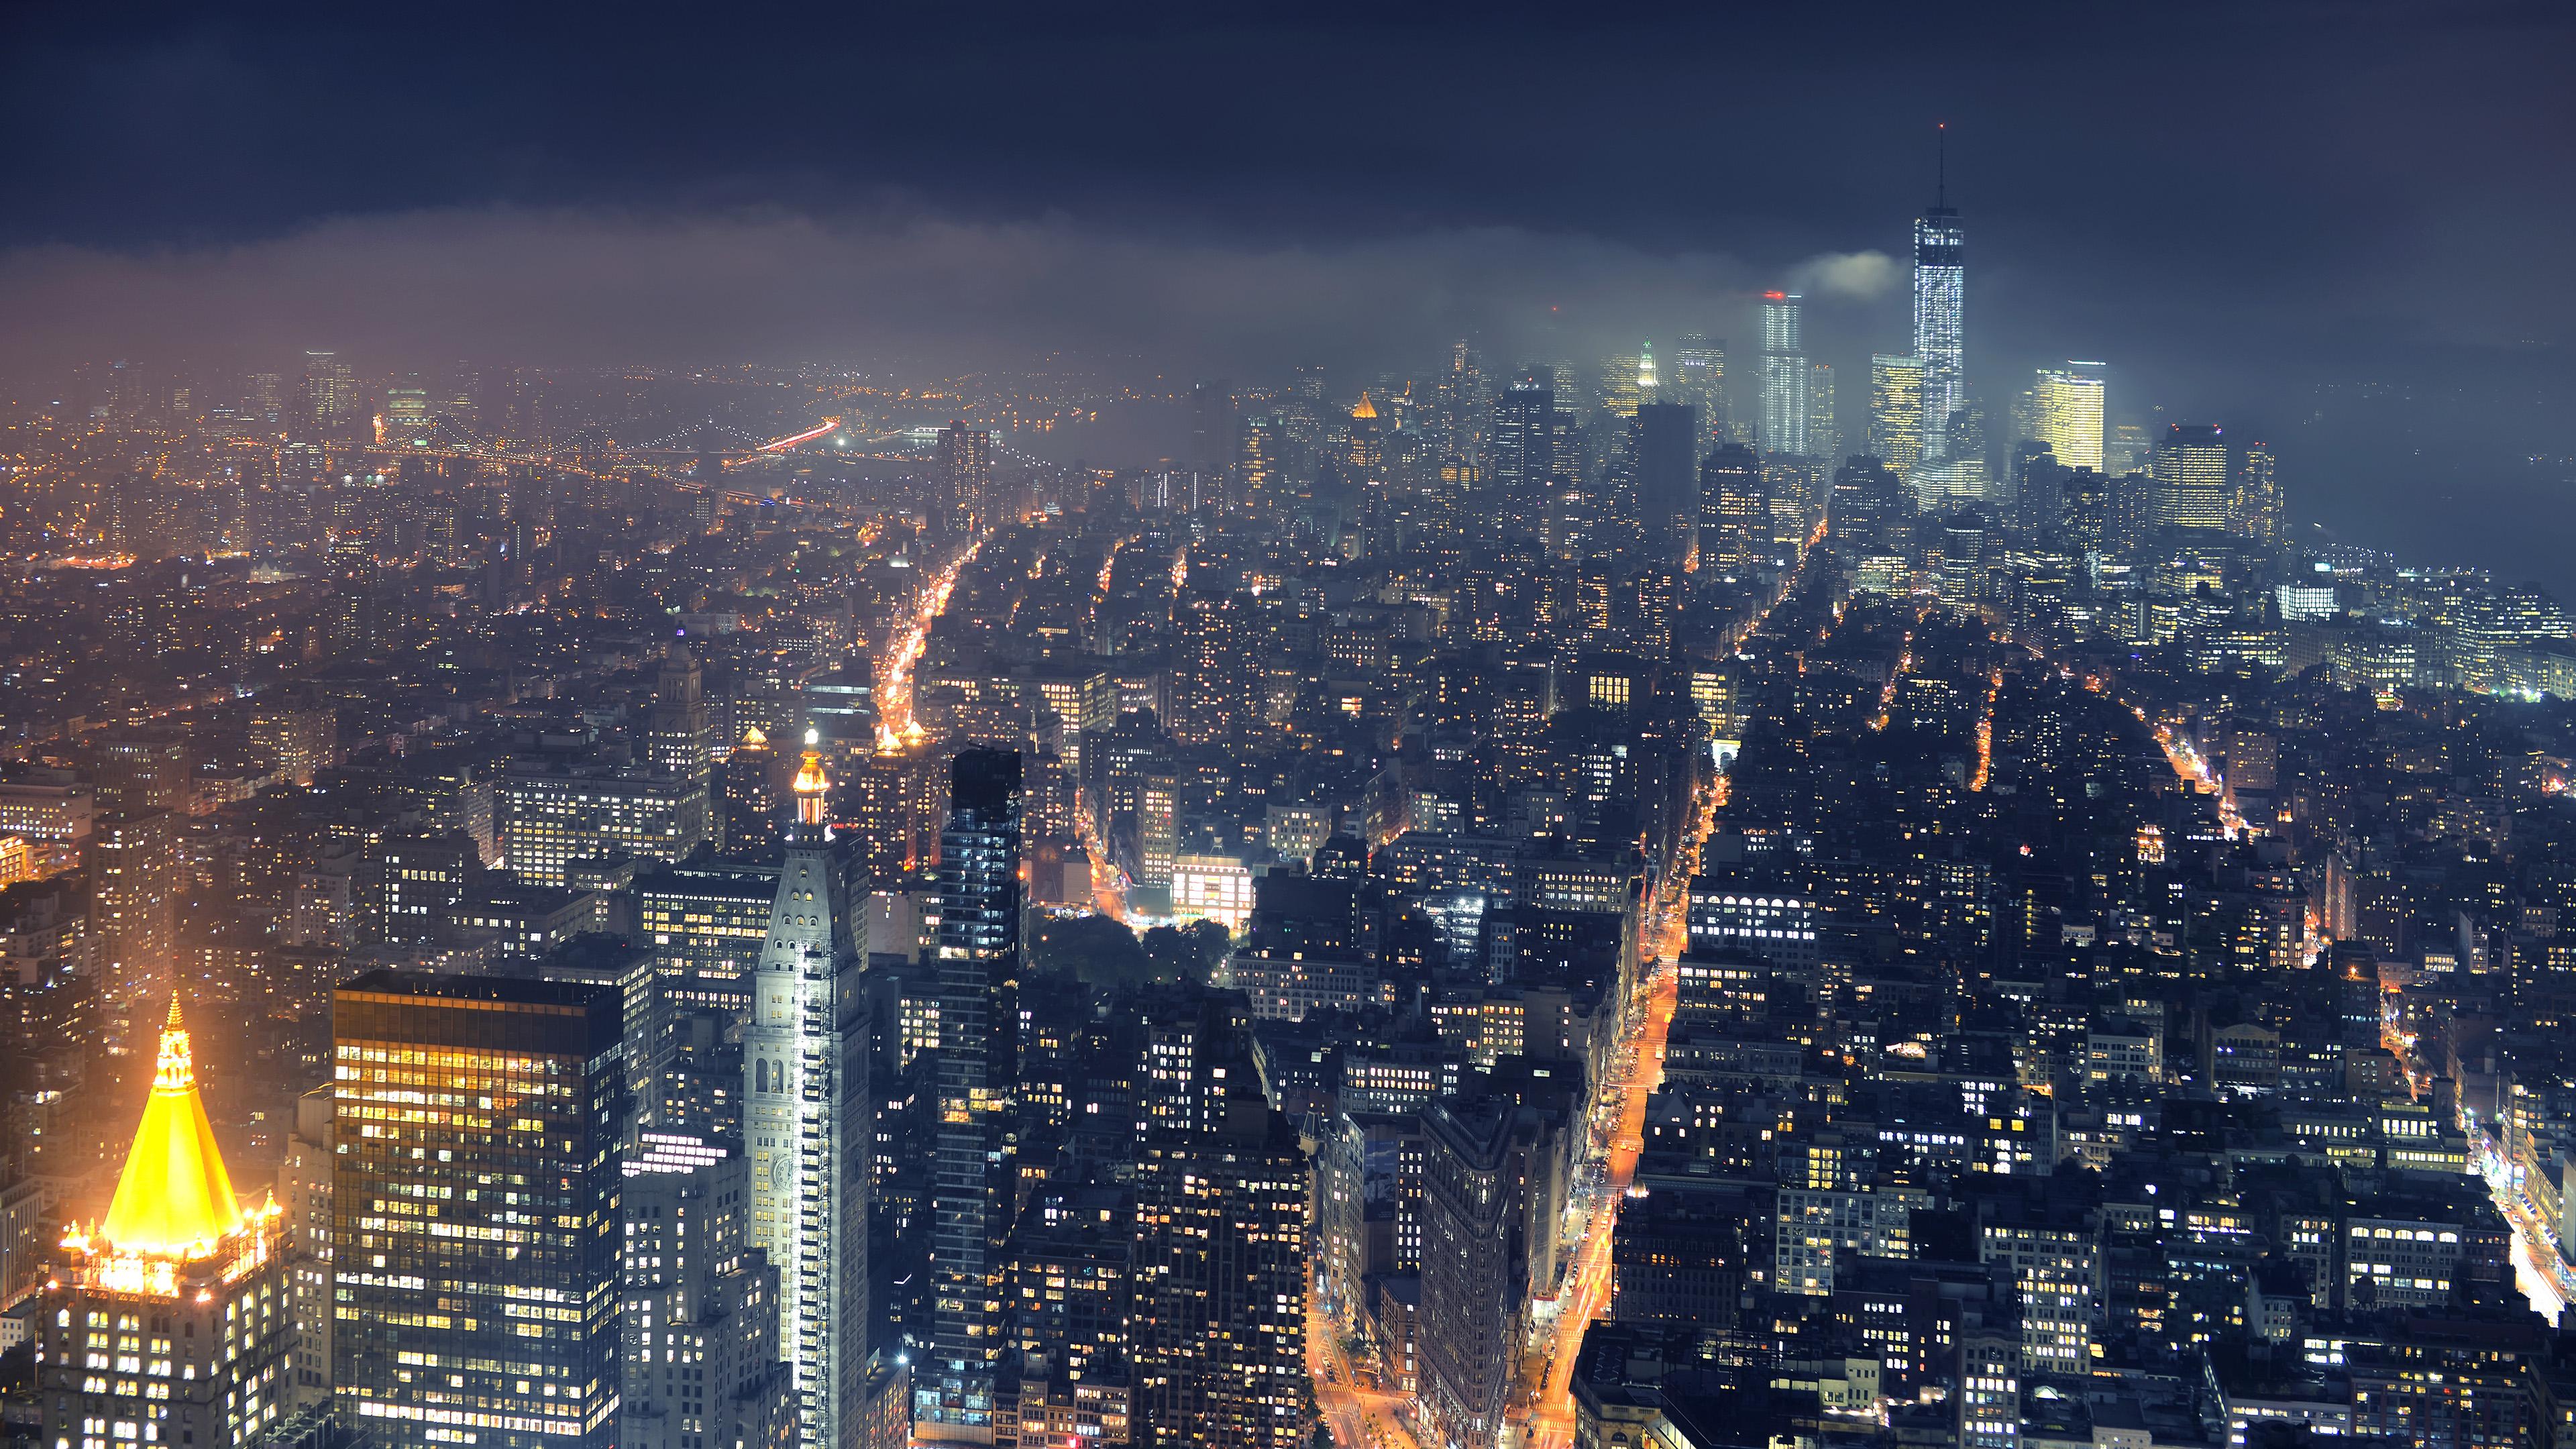 City Manhattan Night Town Usa 3840x2160